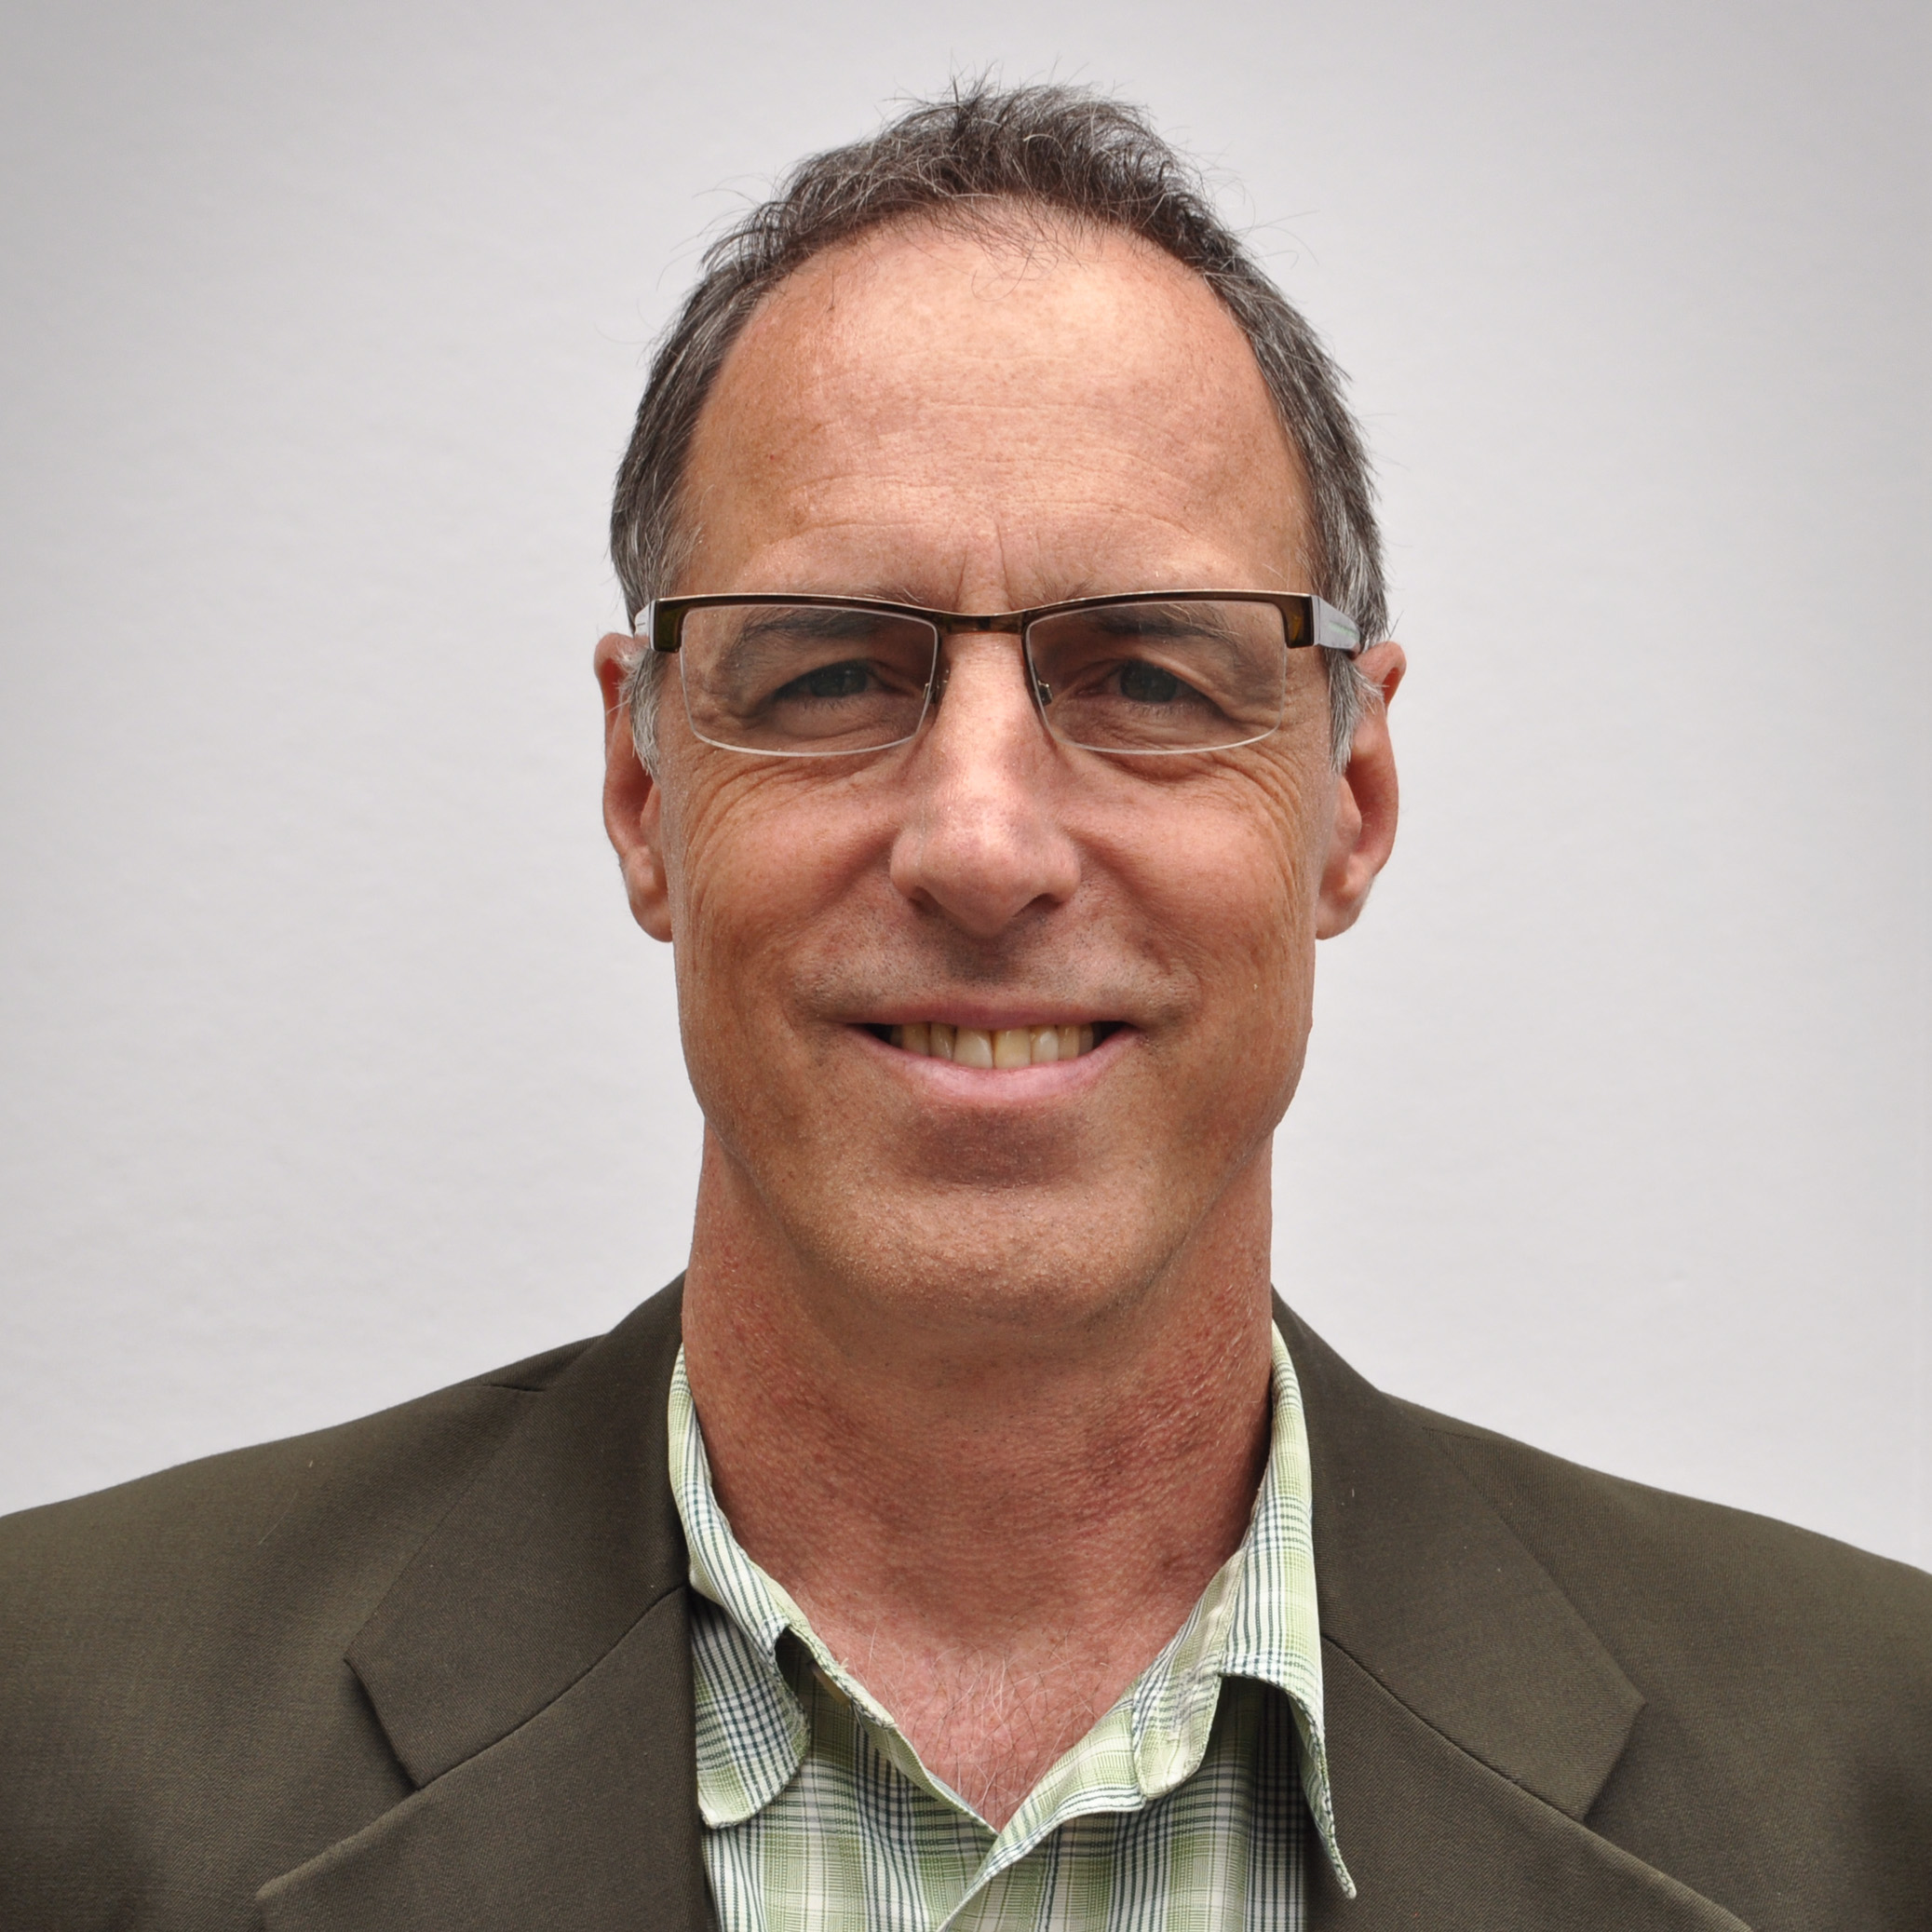 Kevin Bailey - Managing Director